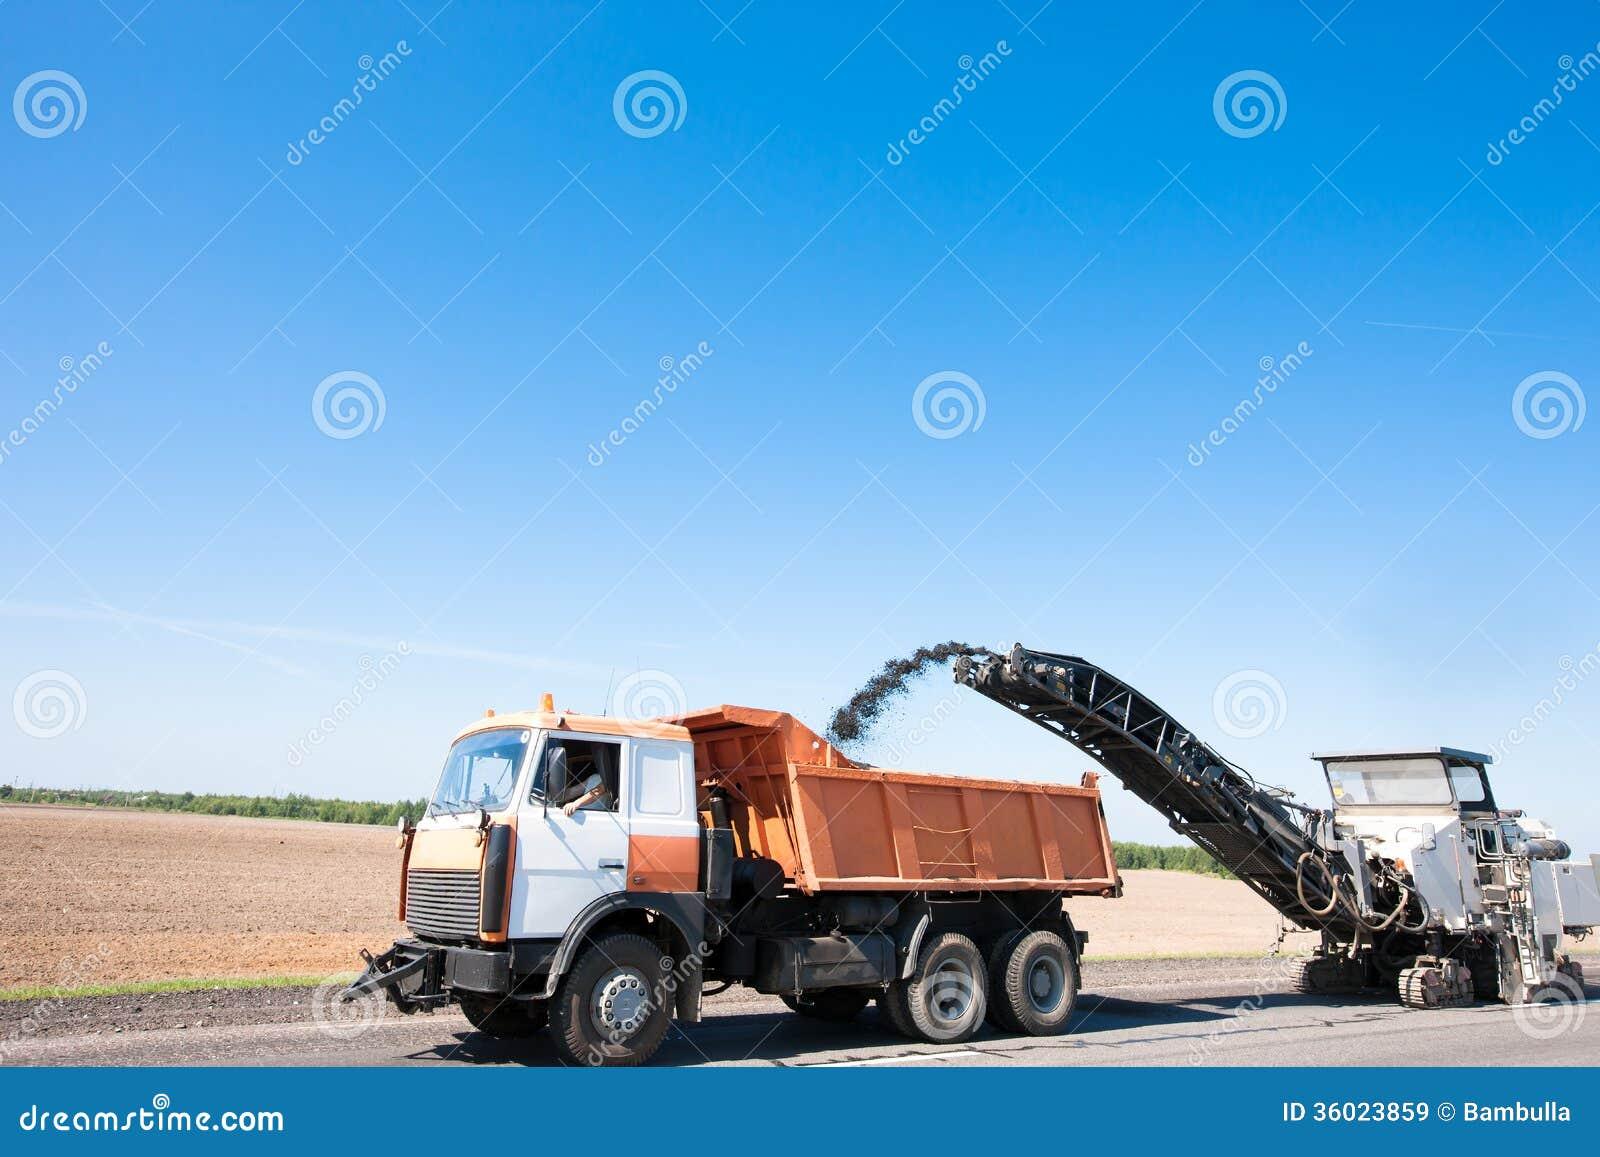 Milling machine removing crushed aphalt into dump truck